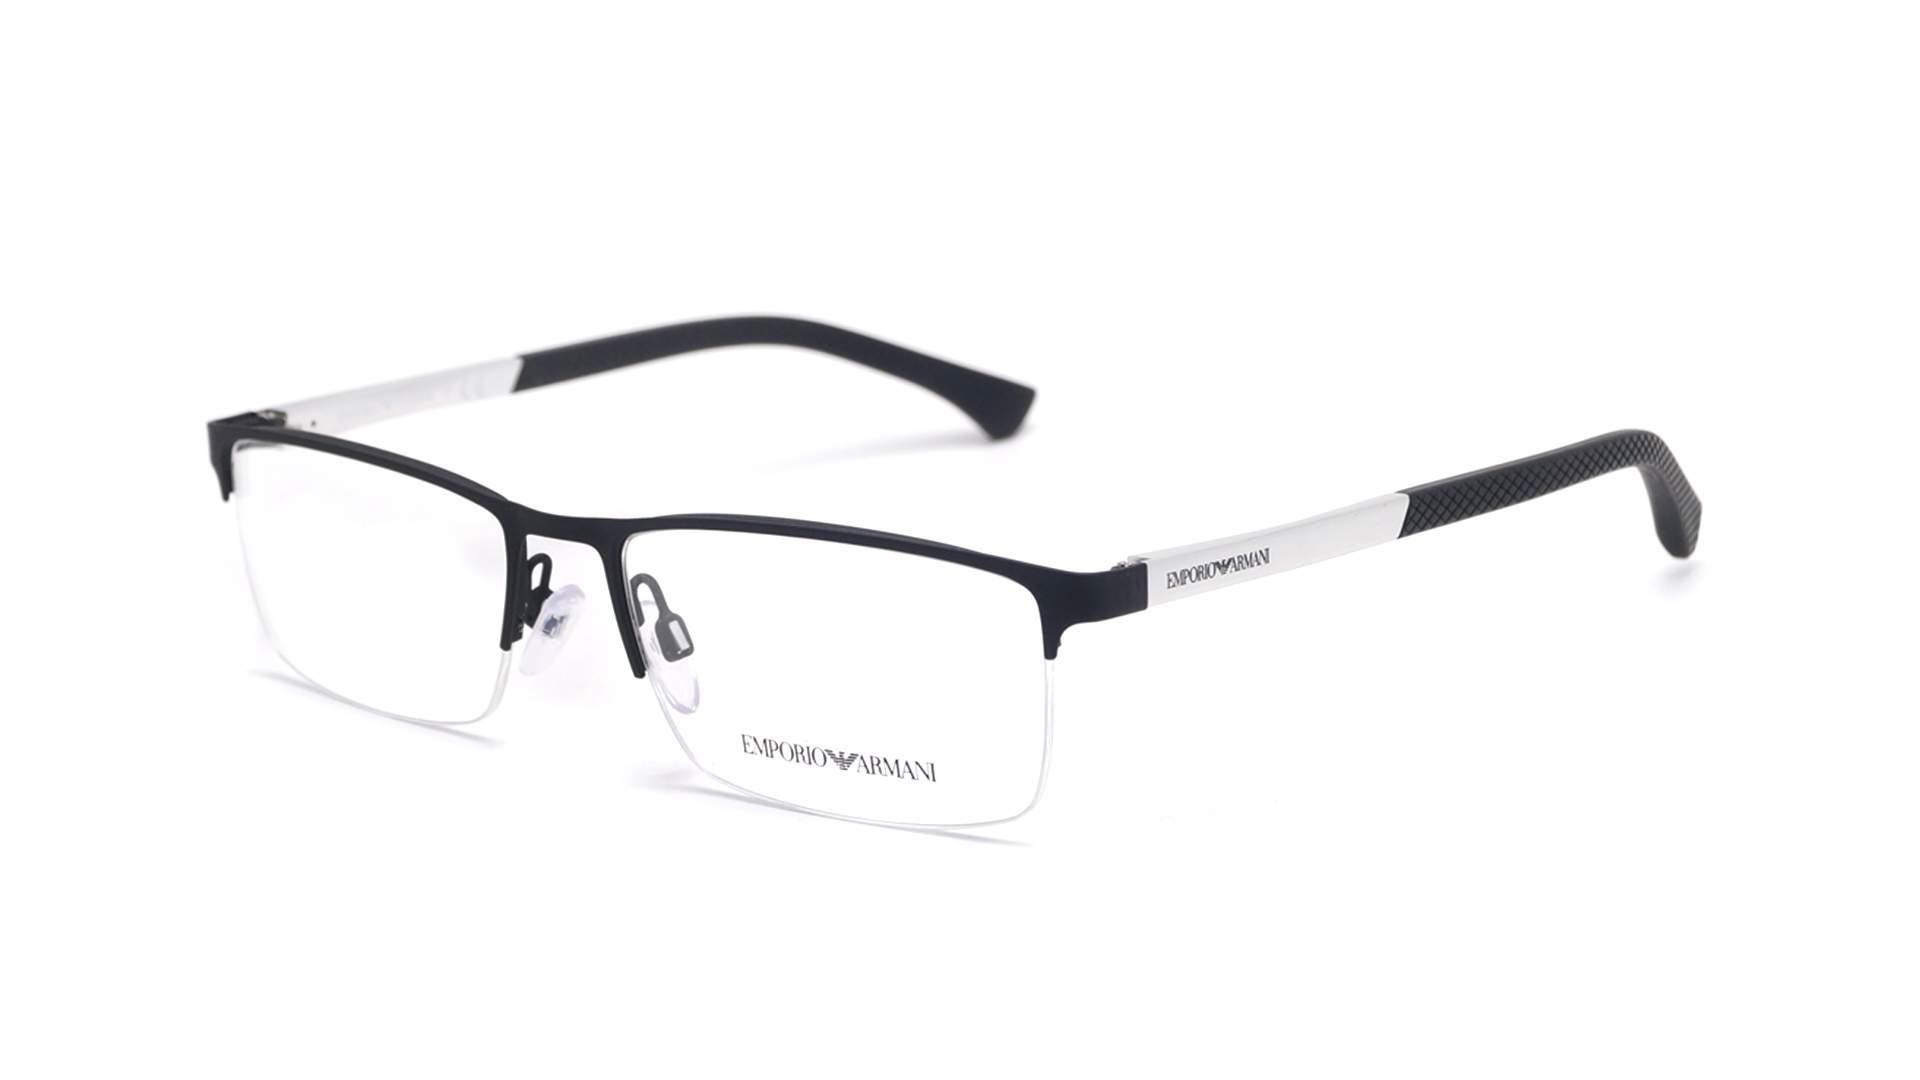 92e1fe7cc Eyeglasses Emporio Armani EA1041 3094 55-17 Black Matte Medium